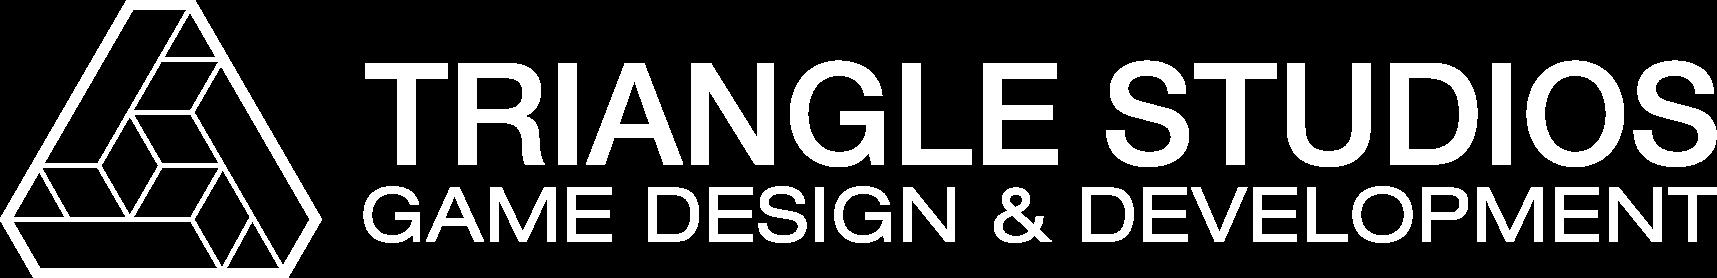 triangle_studios_logo_white.png